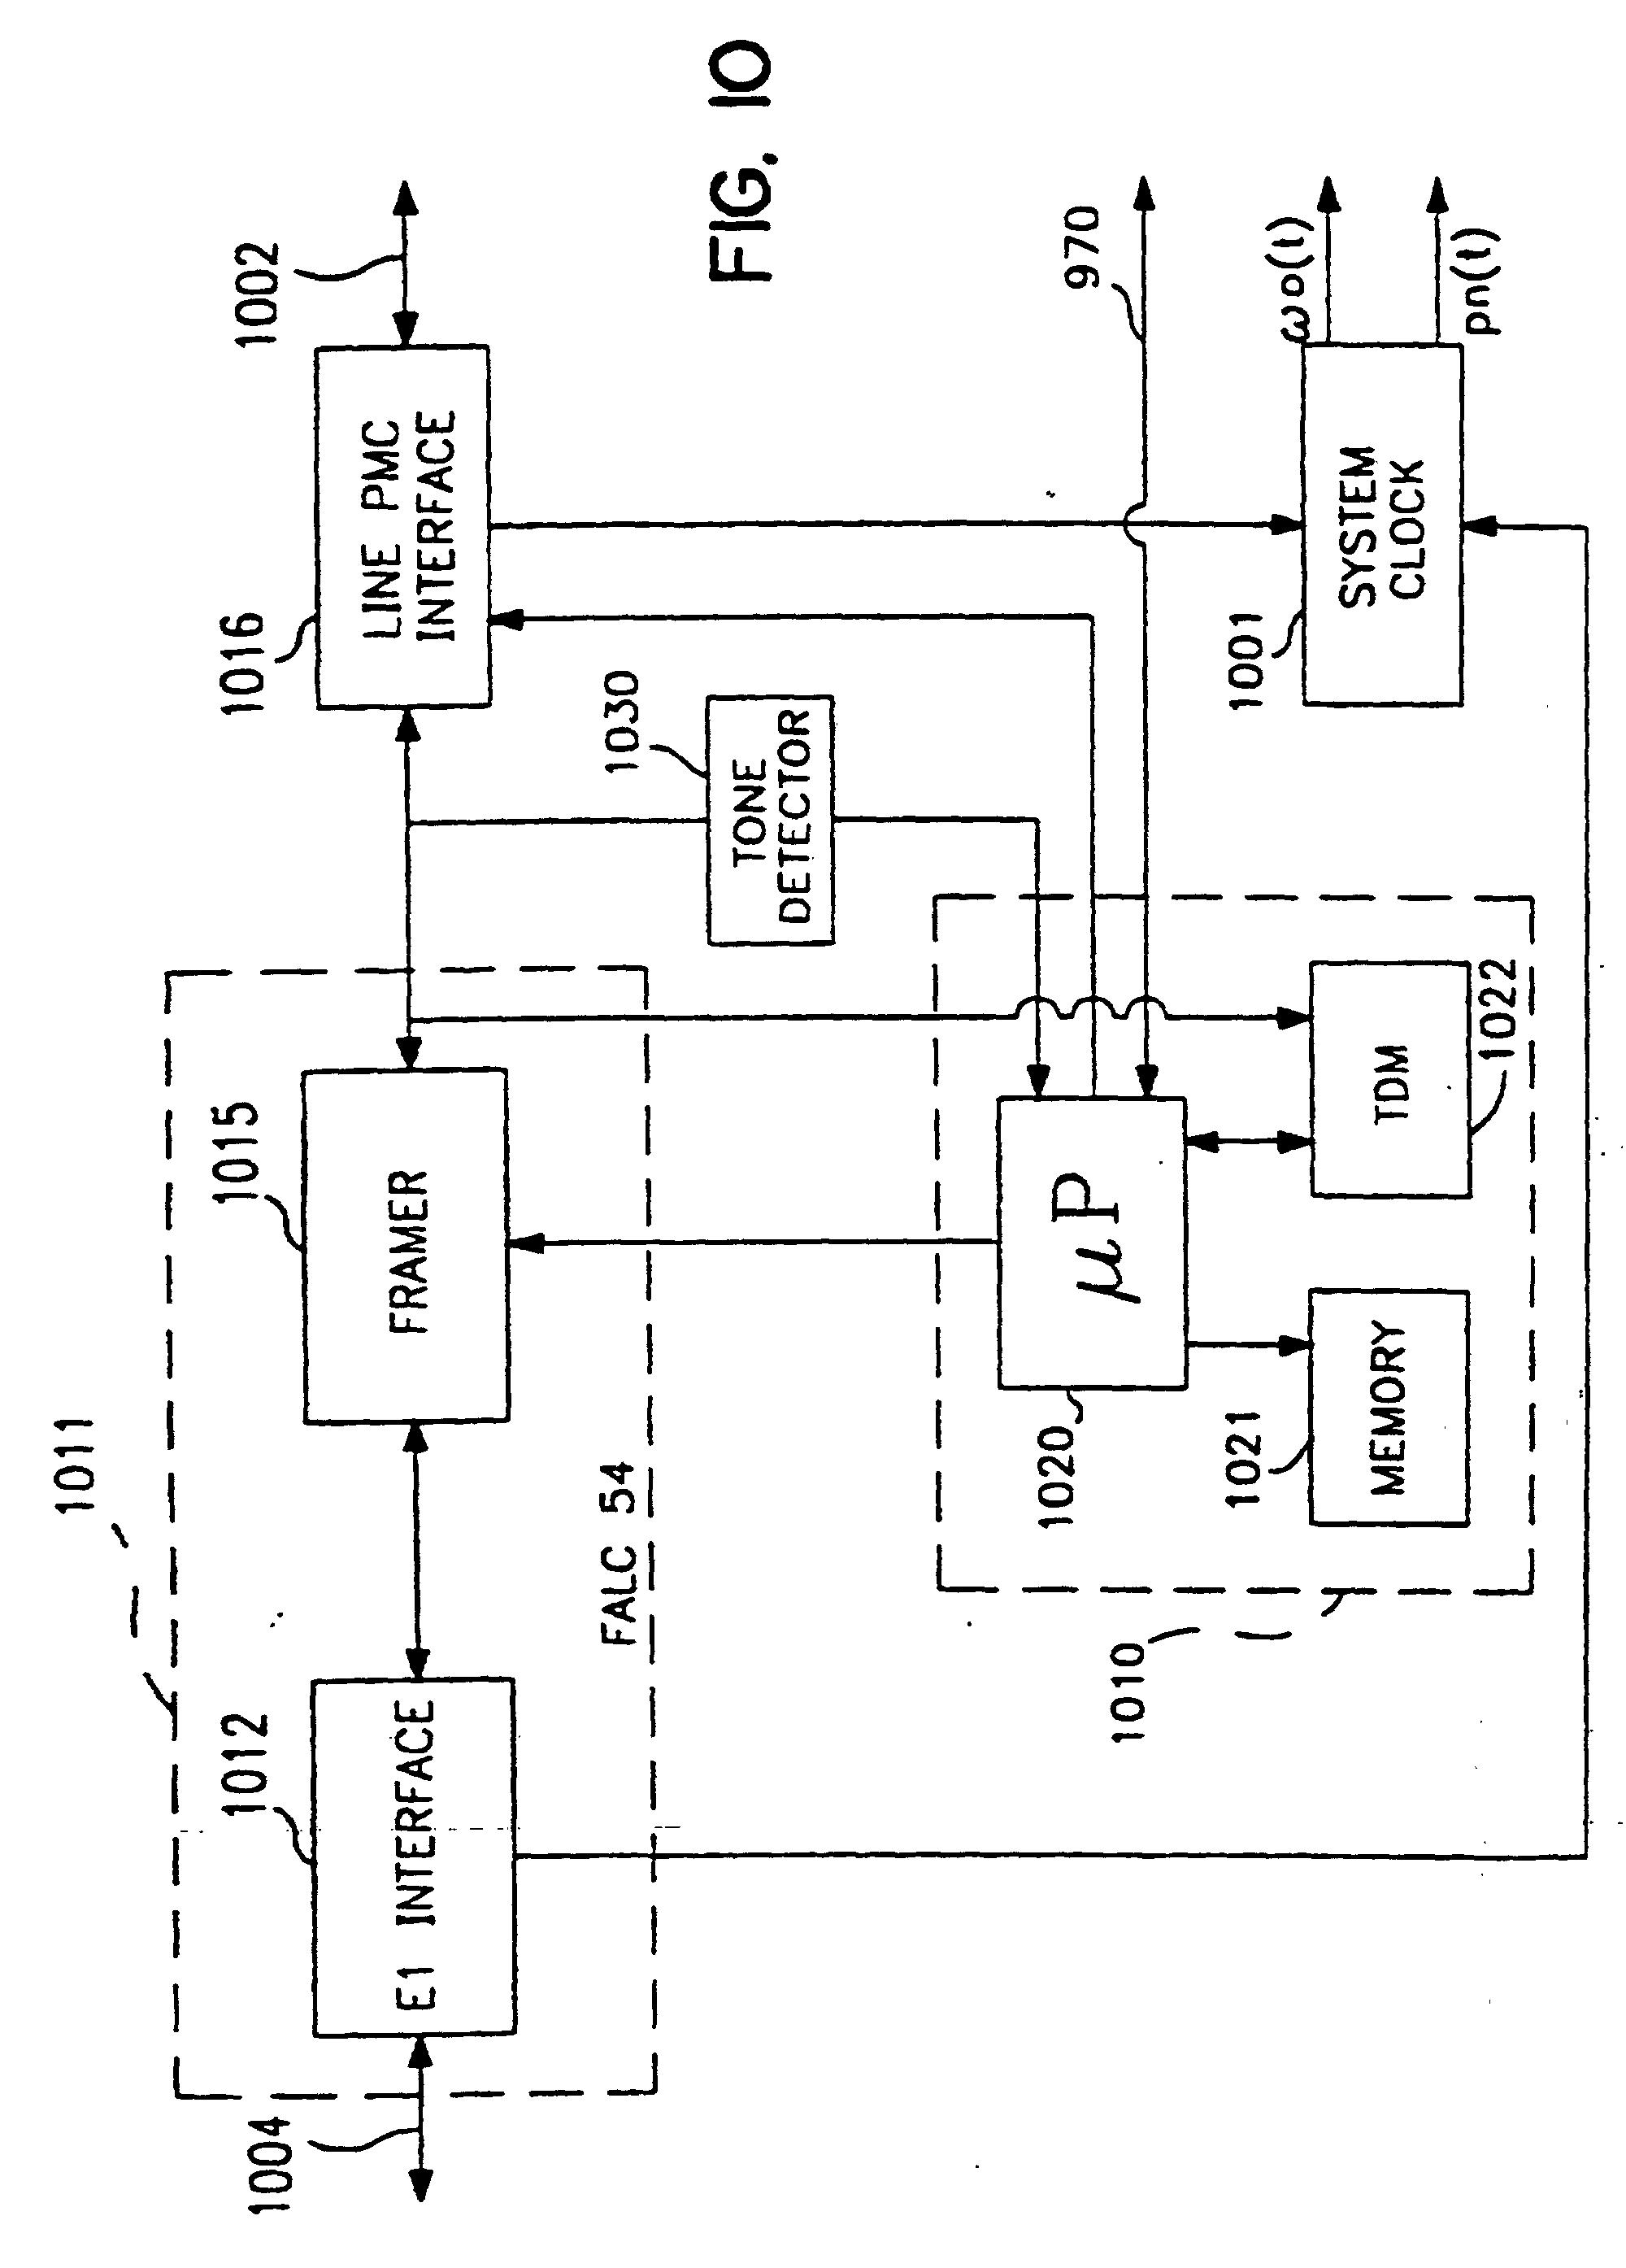 Yamaha 350 Ir Kodak Wiring Diagram